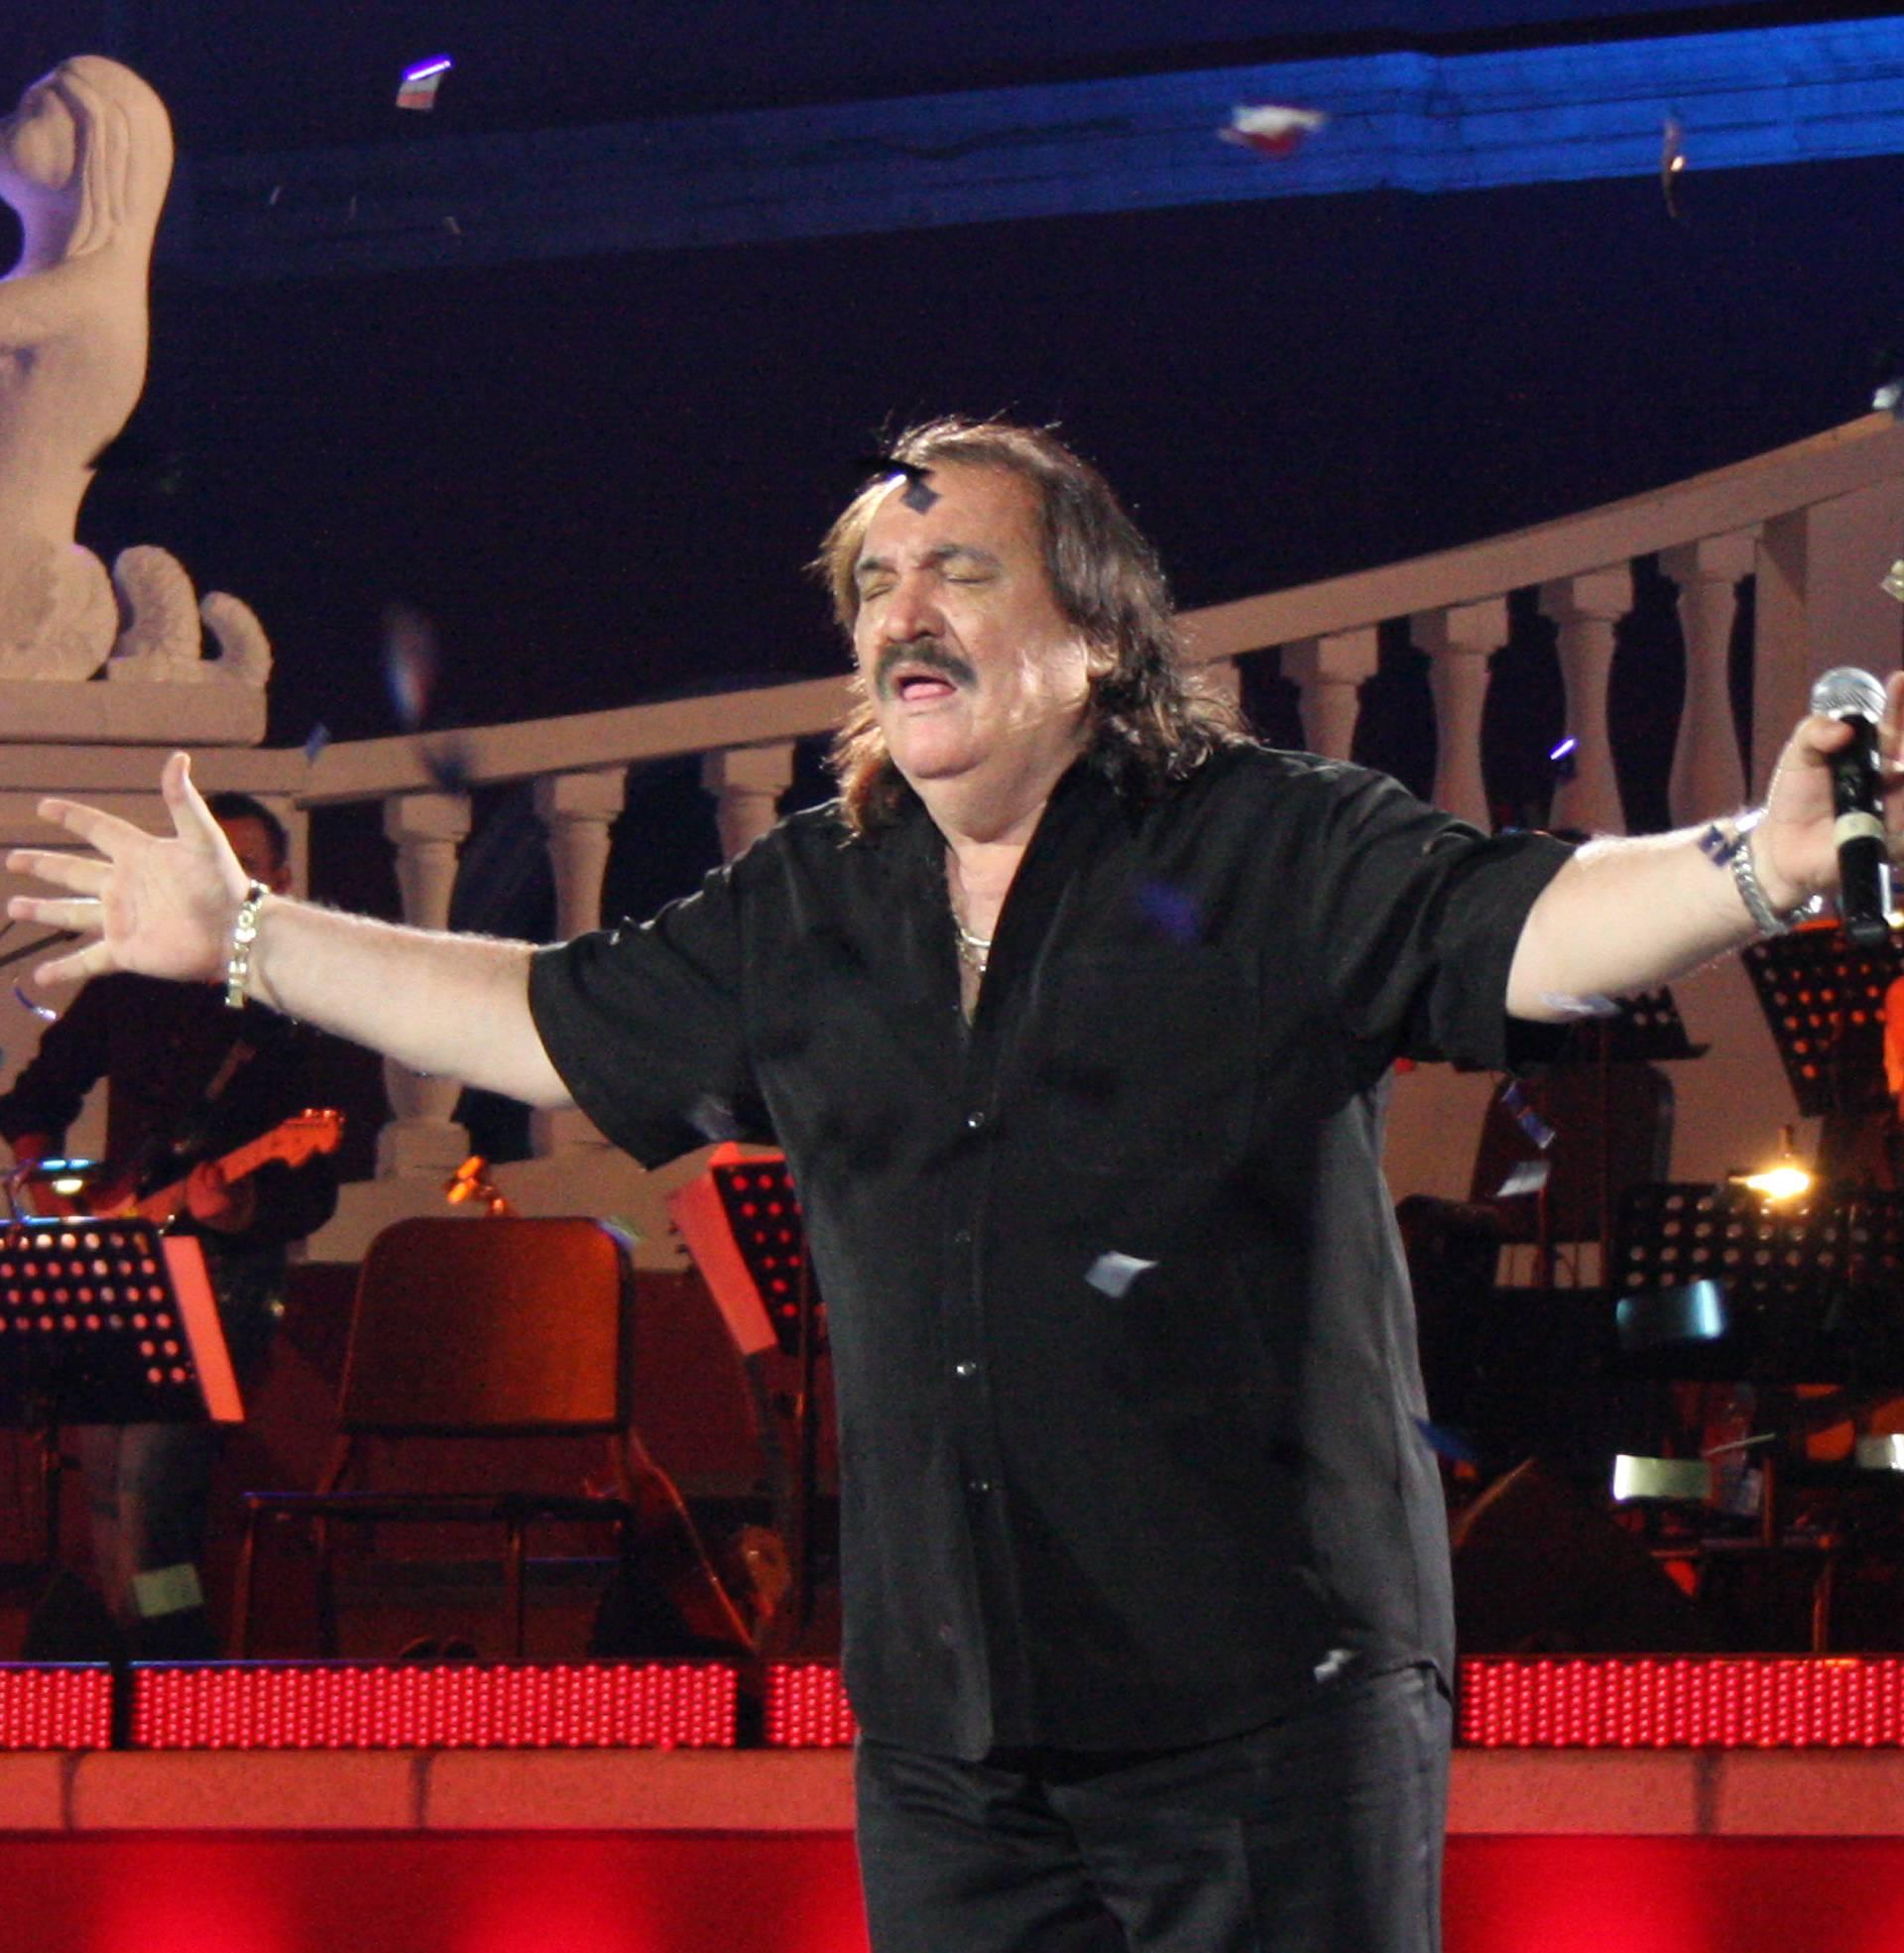 'Mene je publika stvorila, a pjesma neka ide i do svemira'